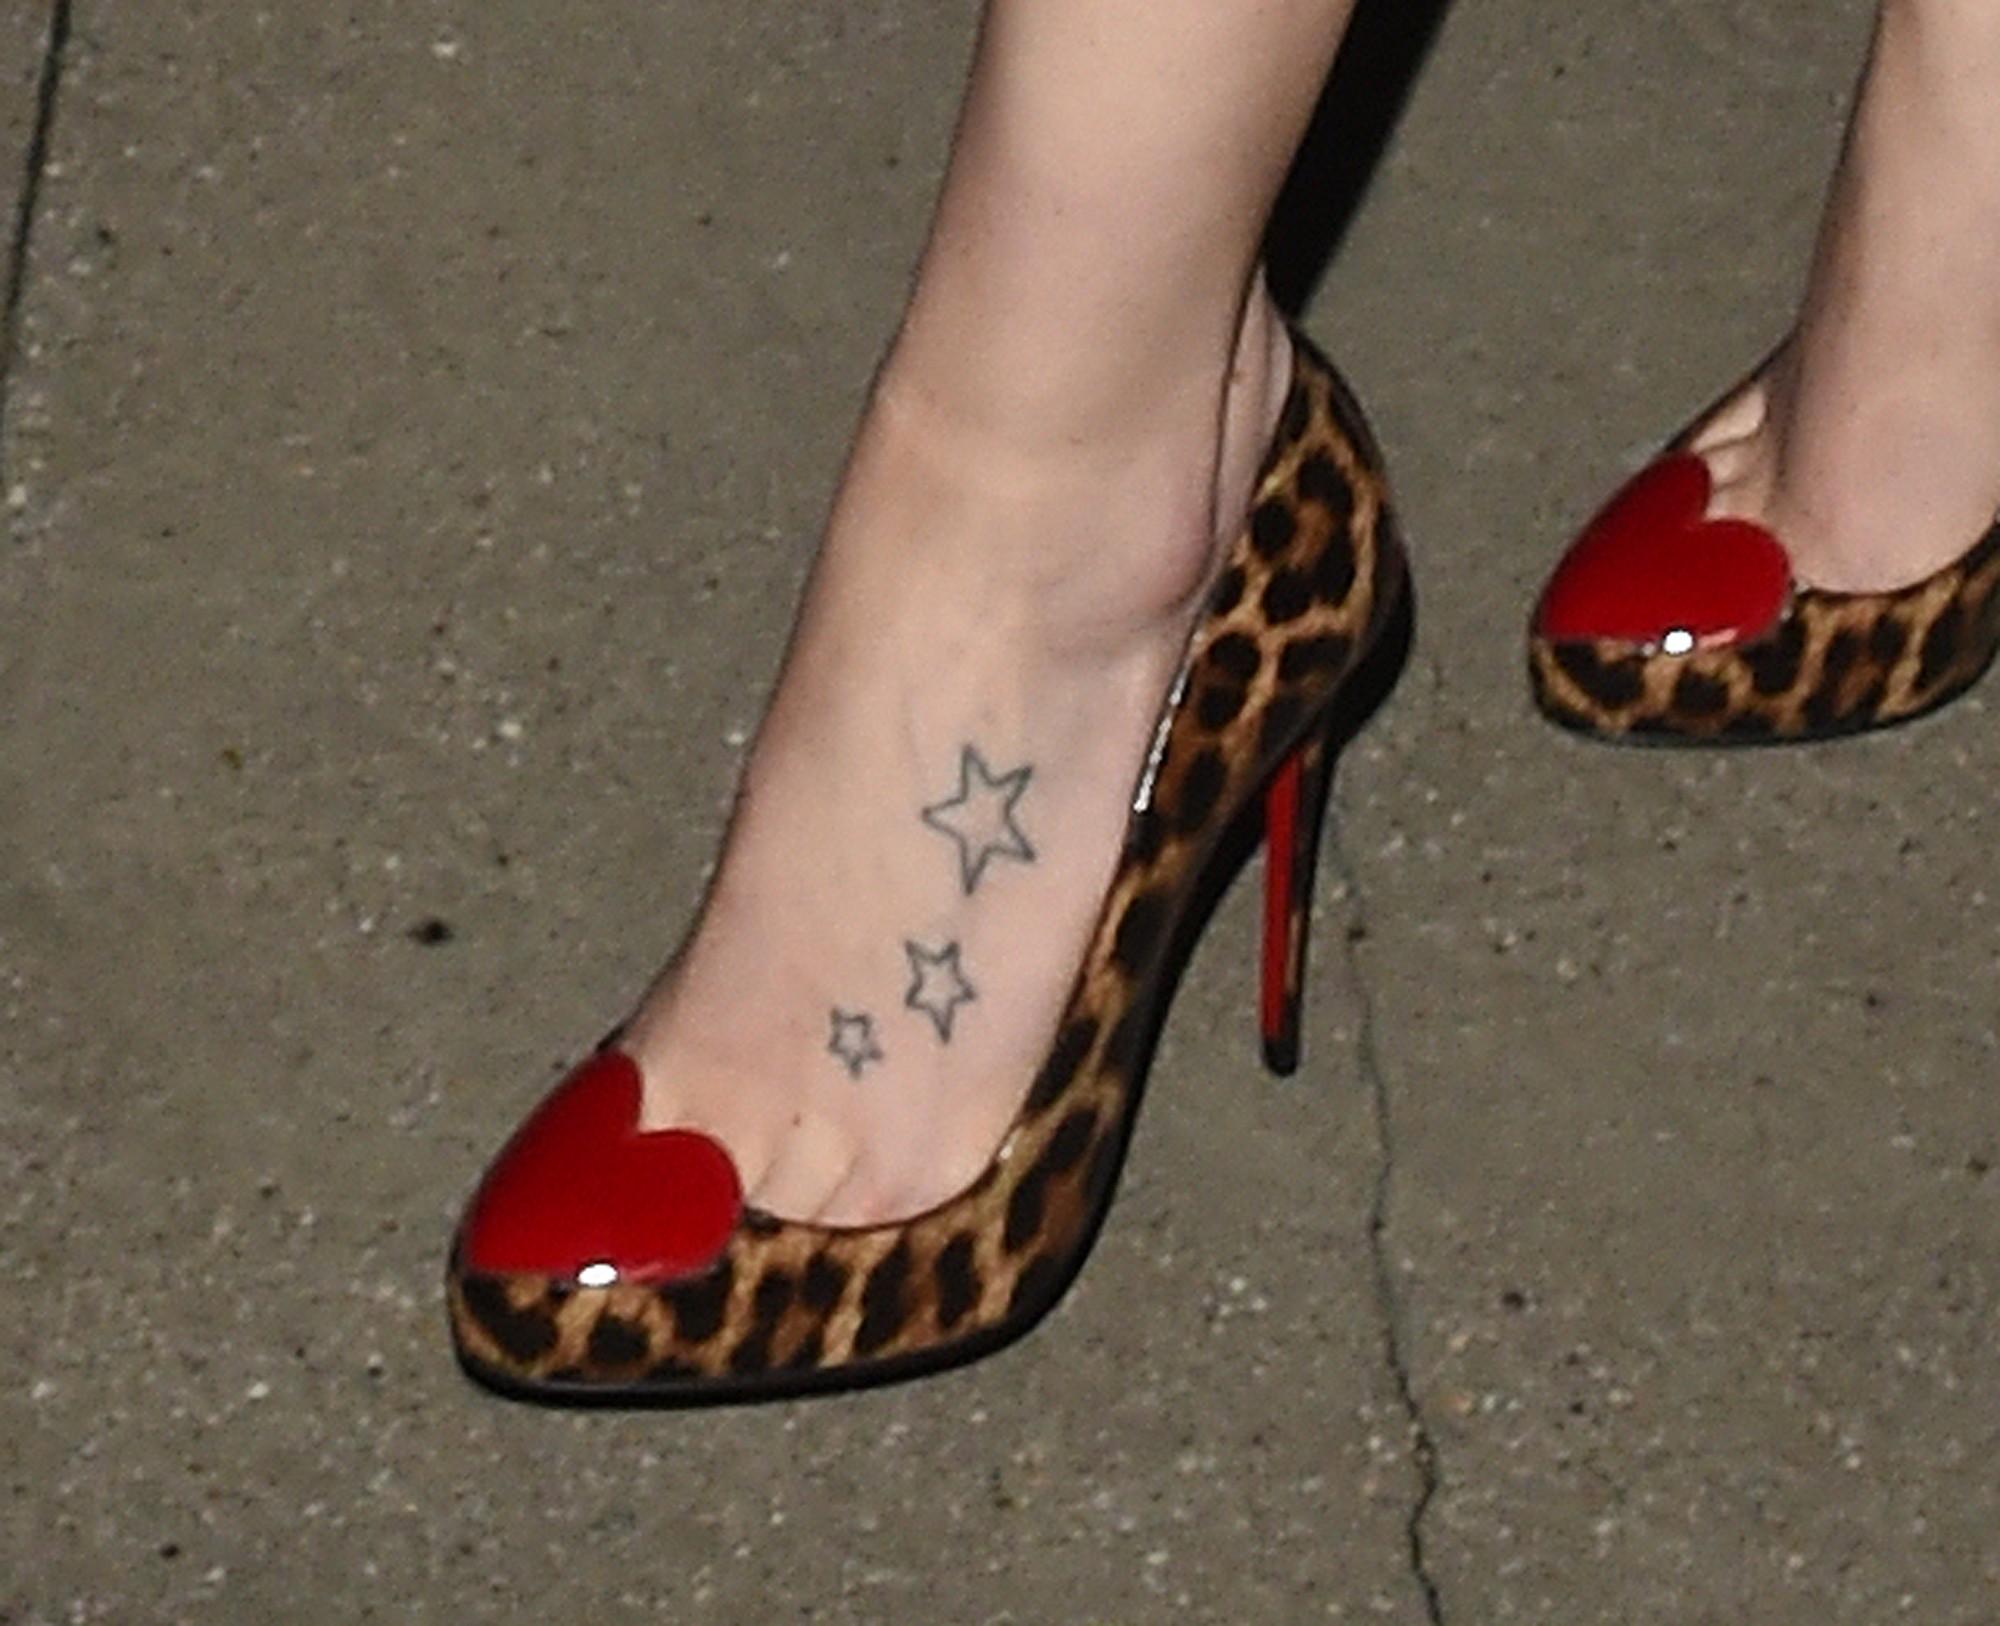 Daisy Tattoos On Foot: Daisy Ridley Has Star Tattoos On Her Left Foot